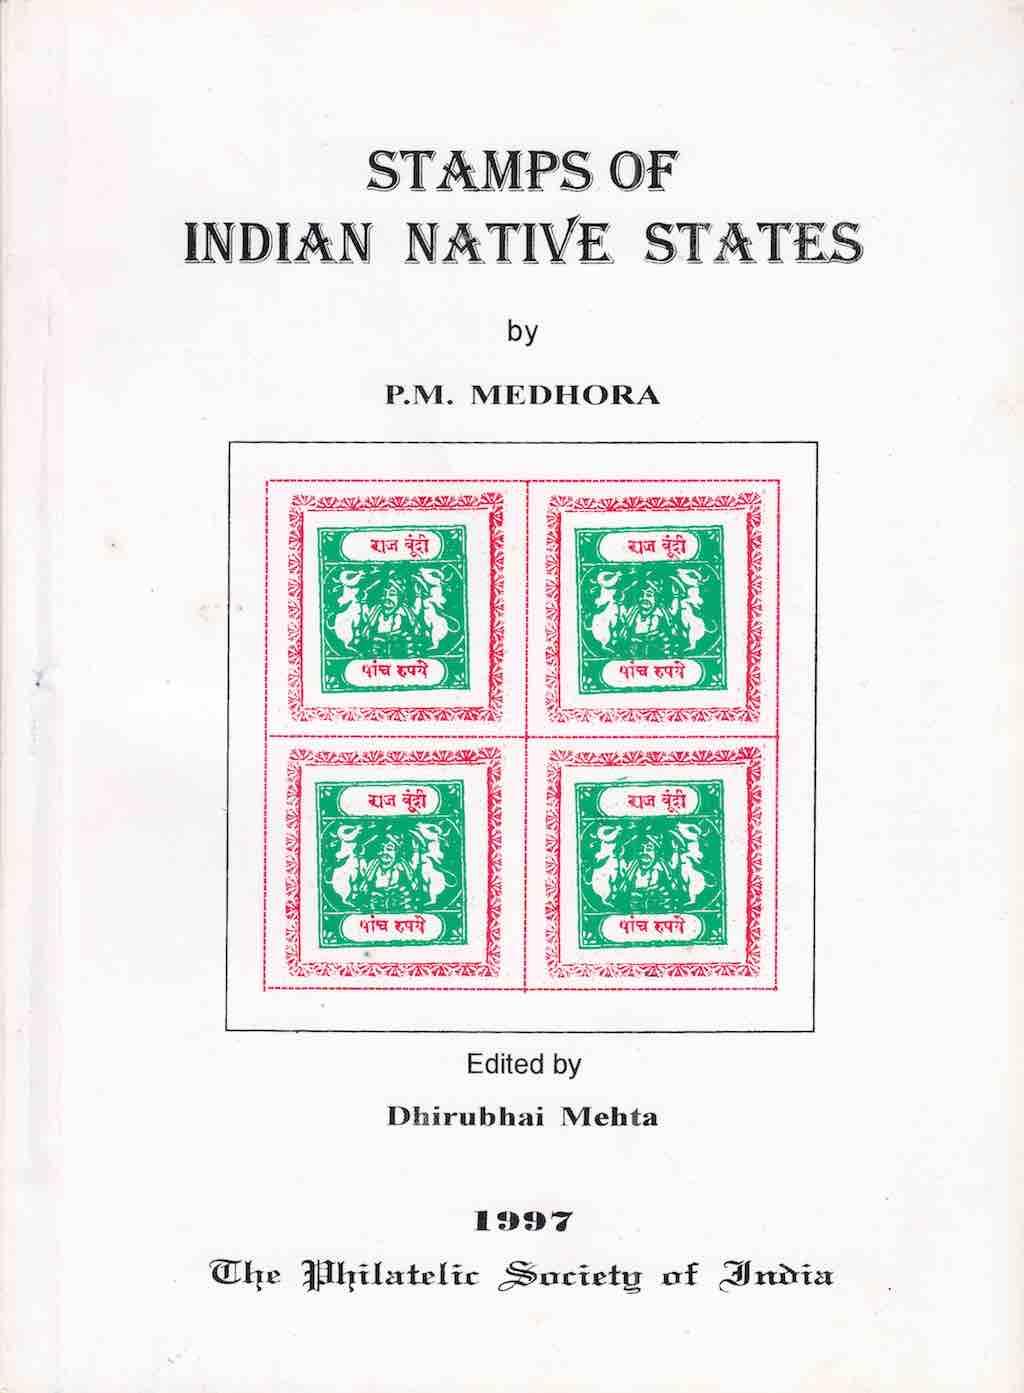 States Native States Medhora